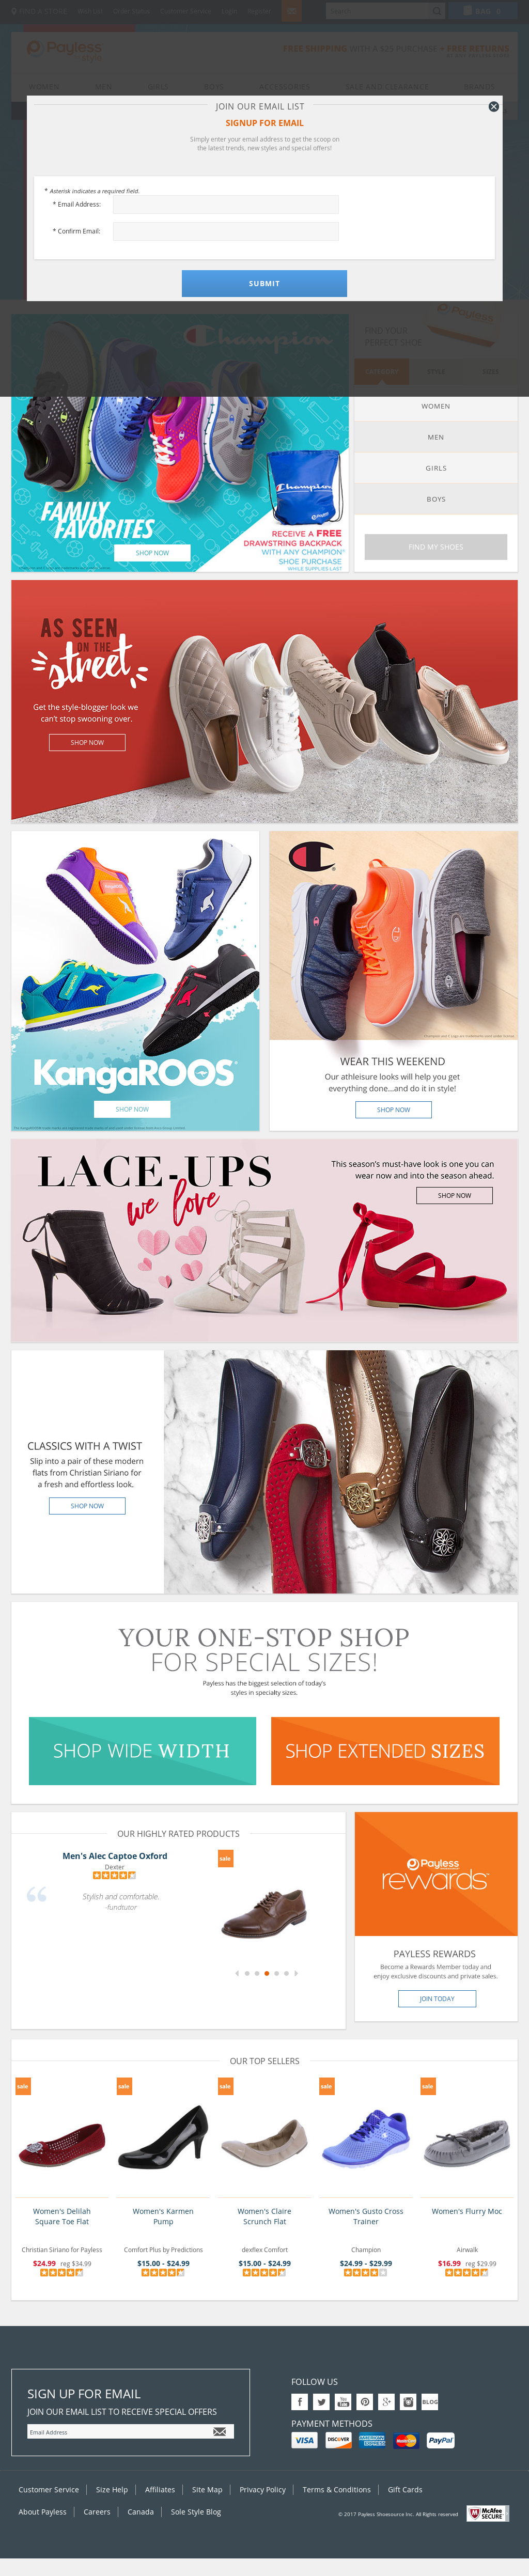 f6d058e5d Payless Shoe source Competitors